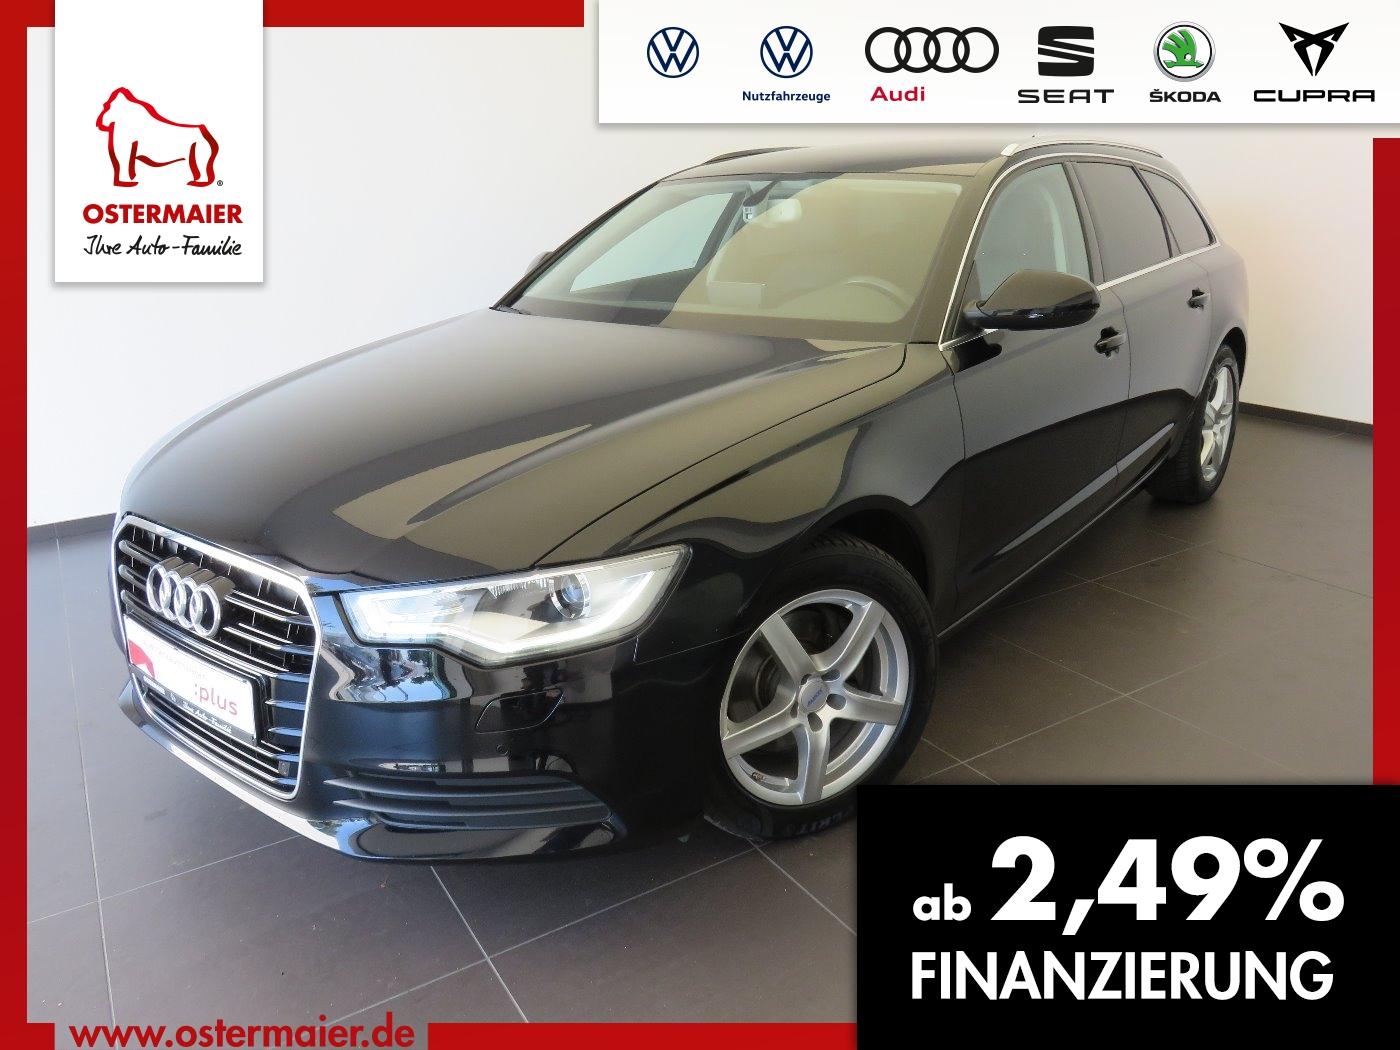 Audi A6 Avant 2.0TDI 177PS.XENON.NAVI.LEDER.STRONIC.S, Jahr 2014, Diesel